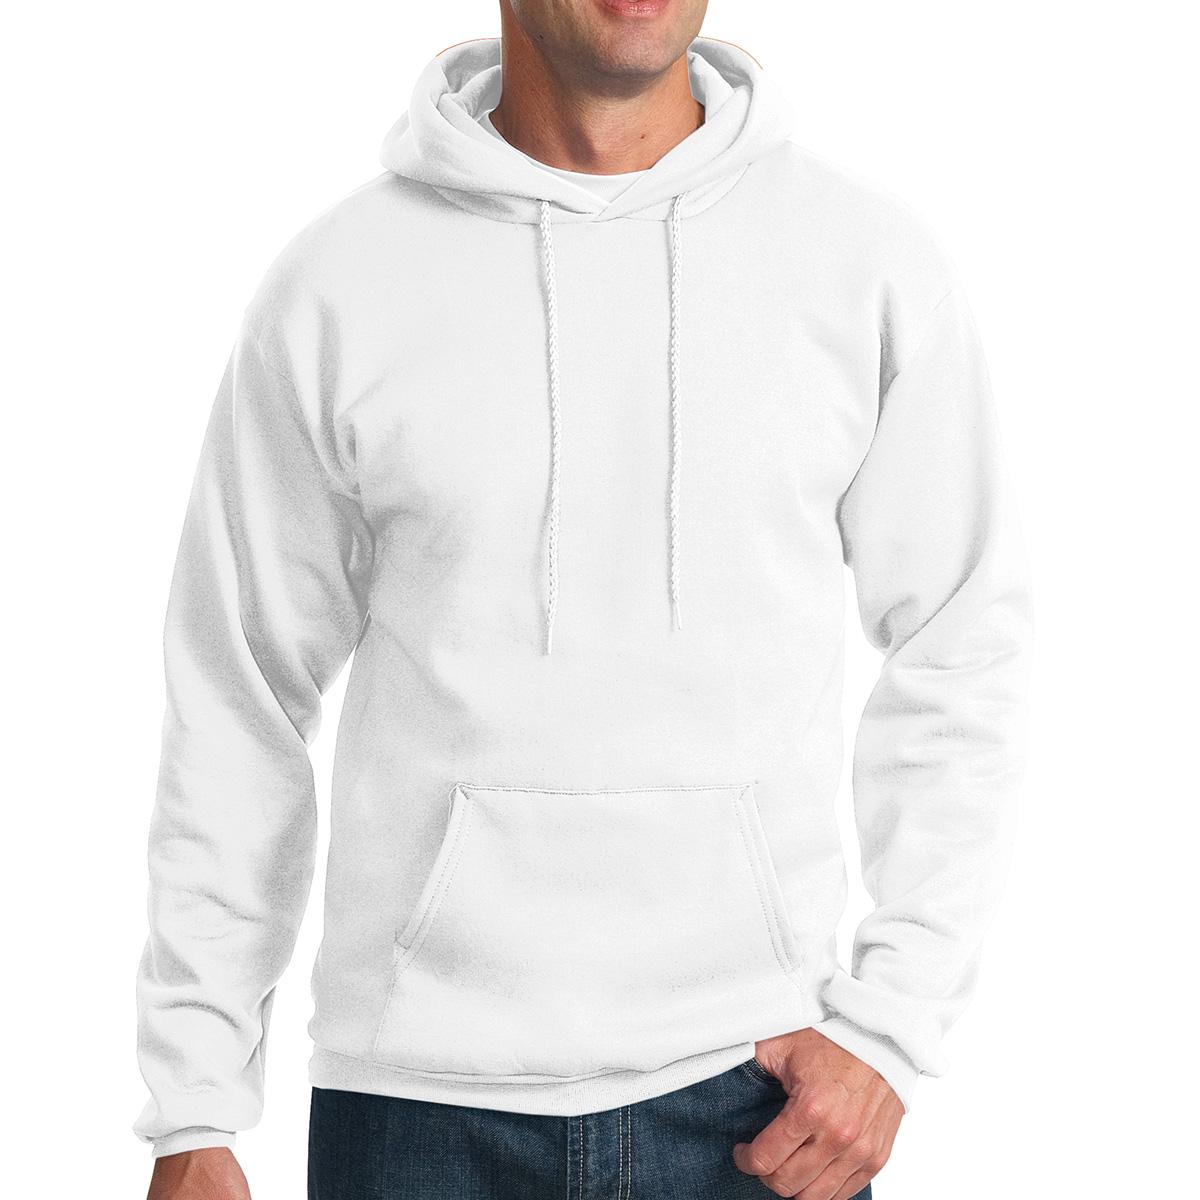 White Port & Company Essential Fleece Pullover Hooded Sweatshirt